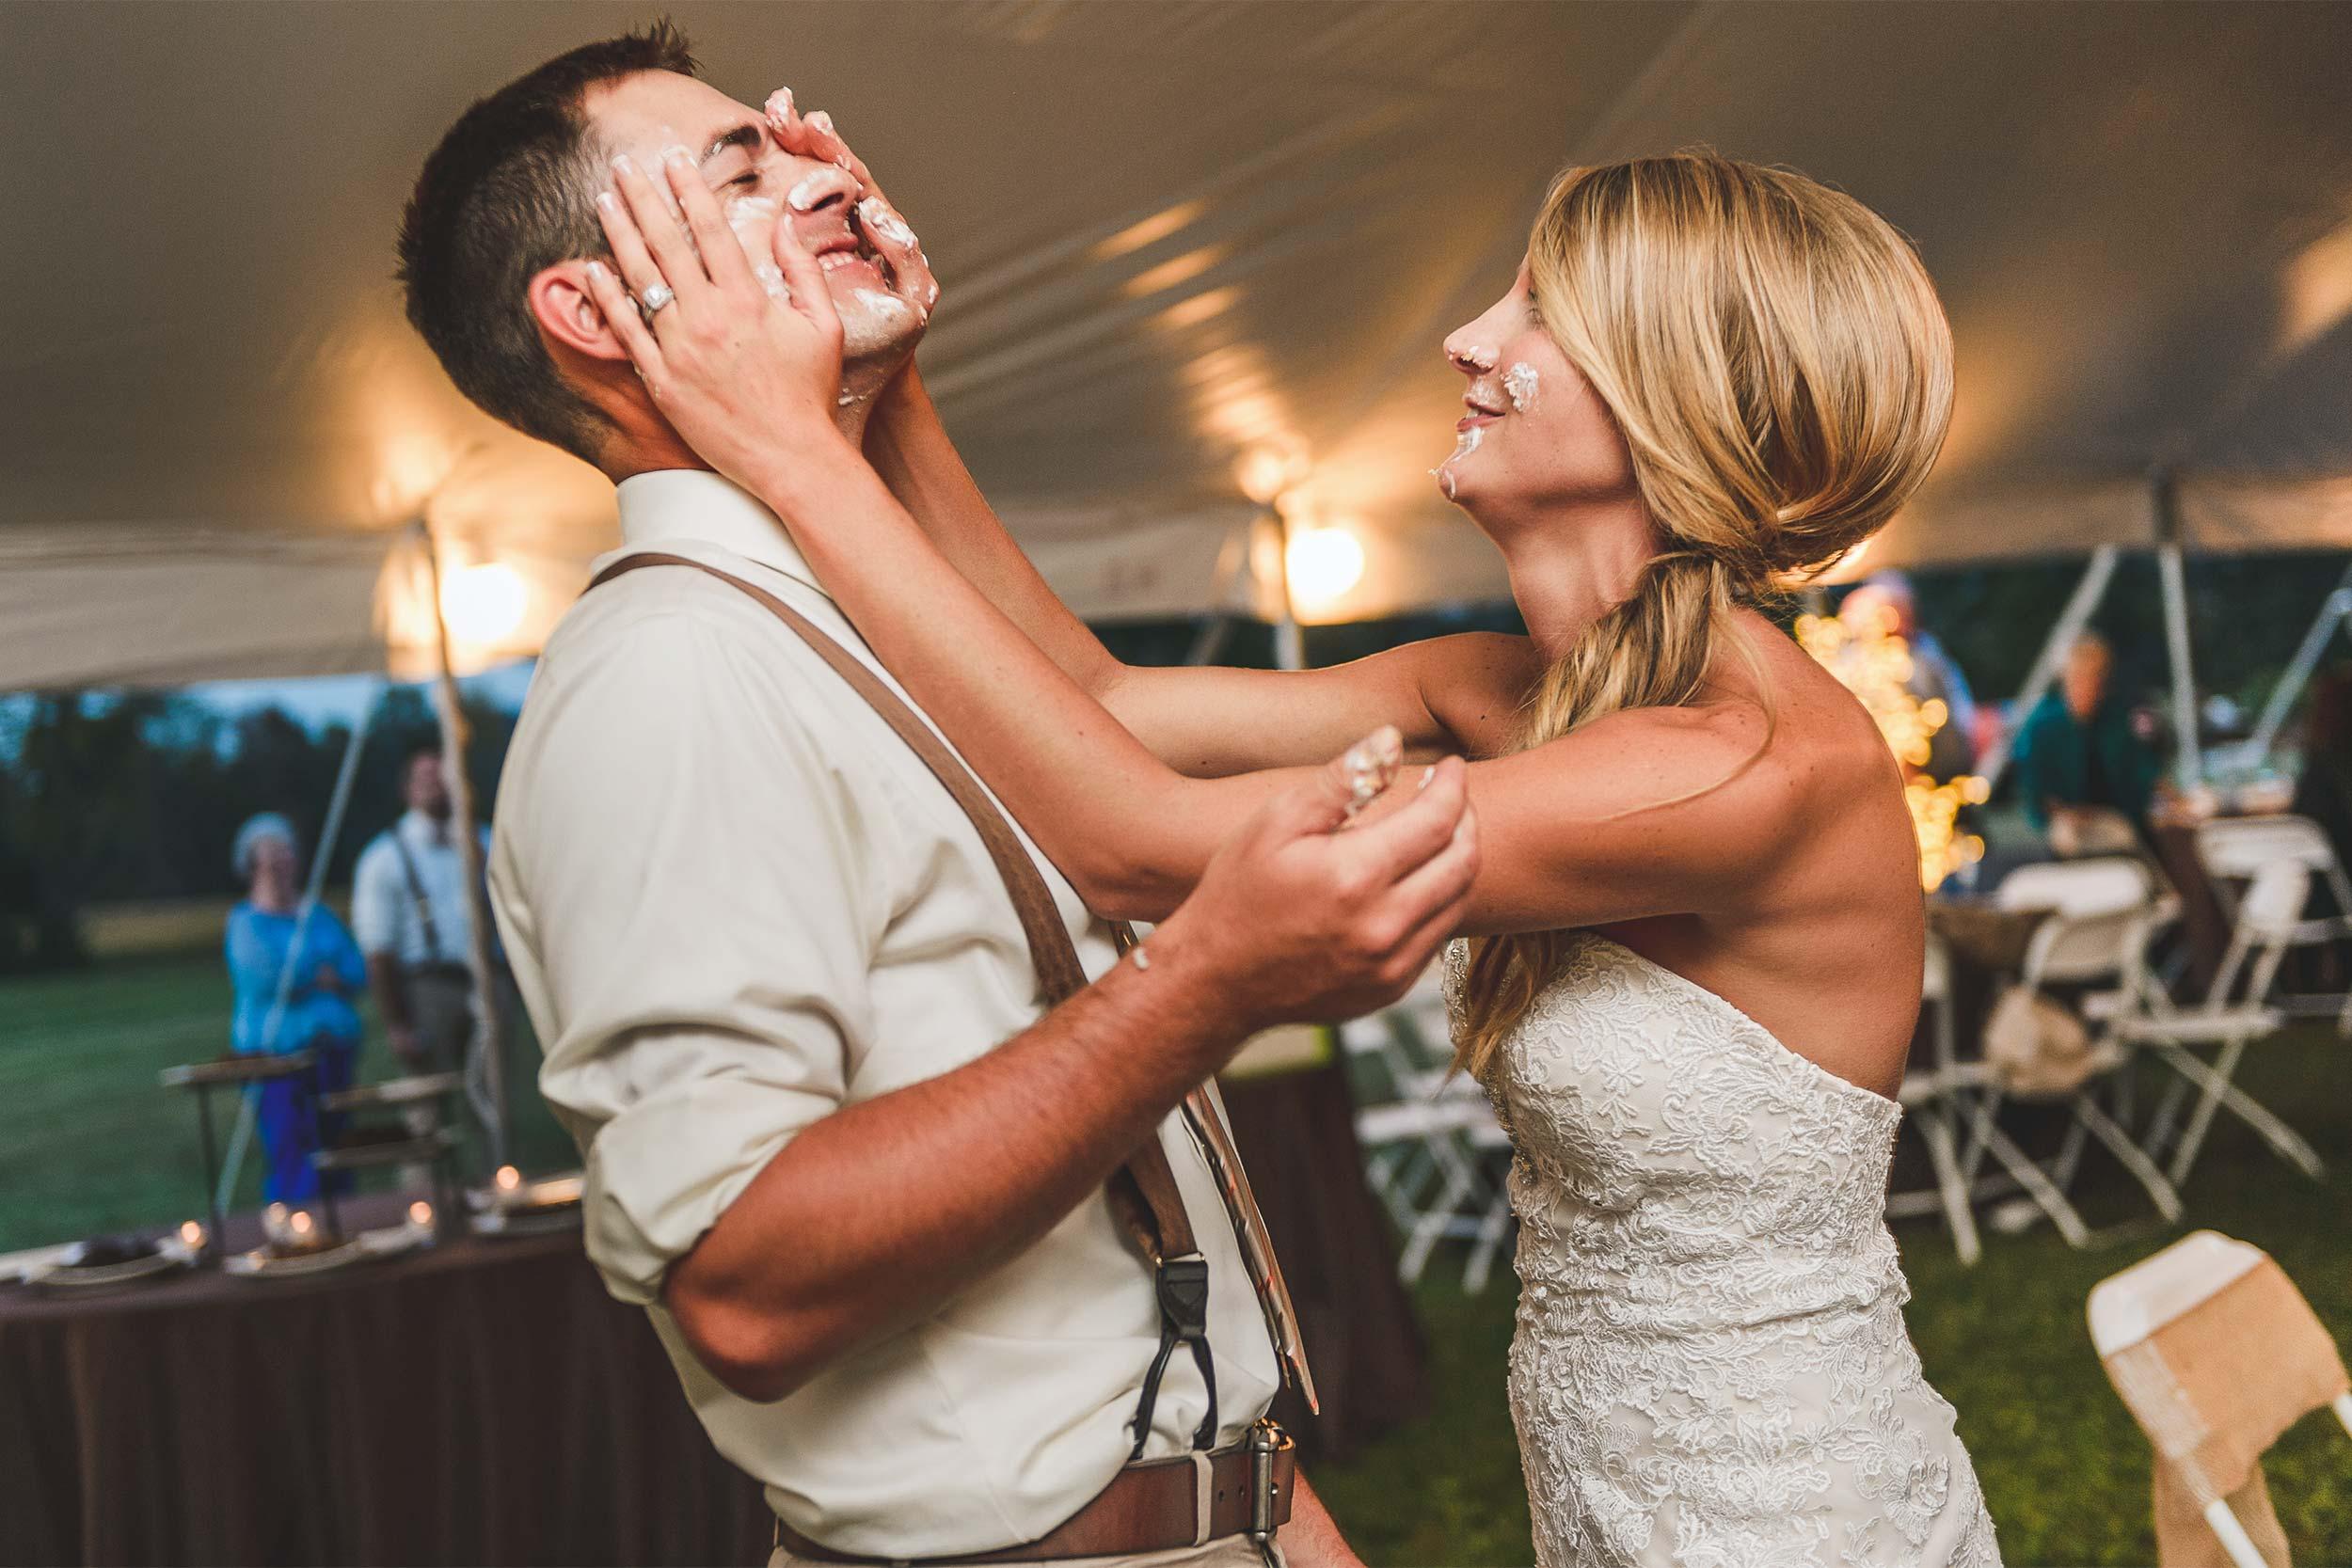 tent-wedding-reception-cake-smash.jpg